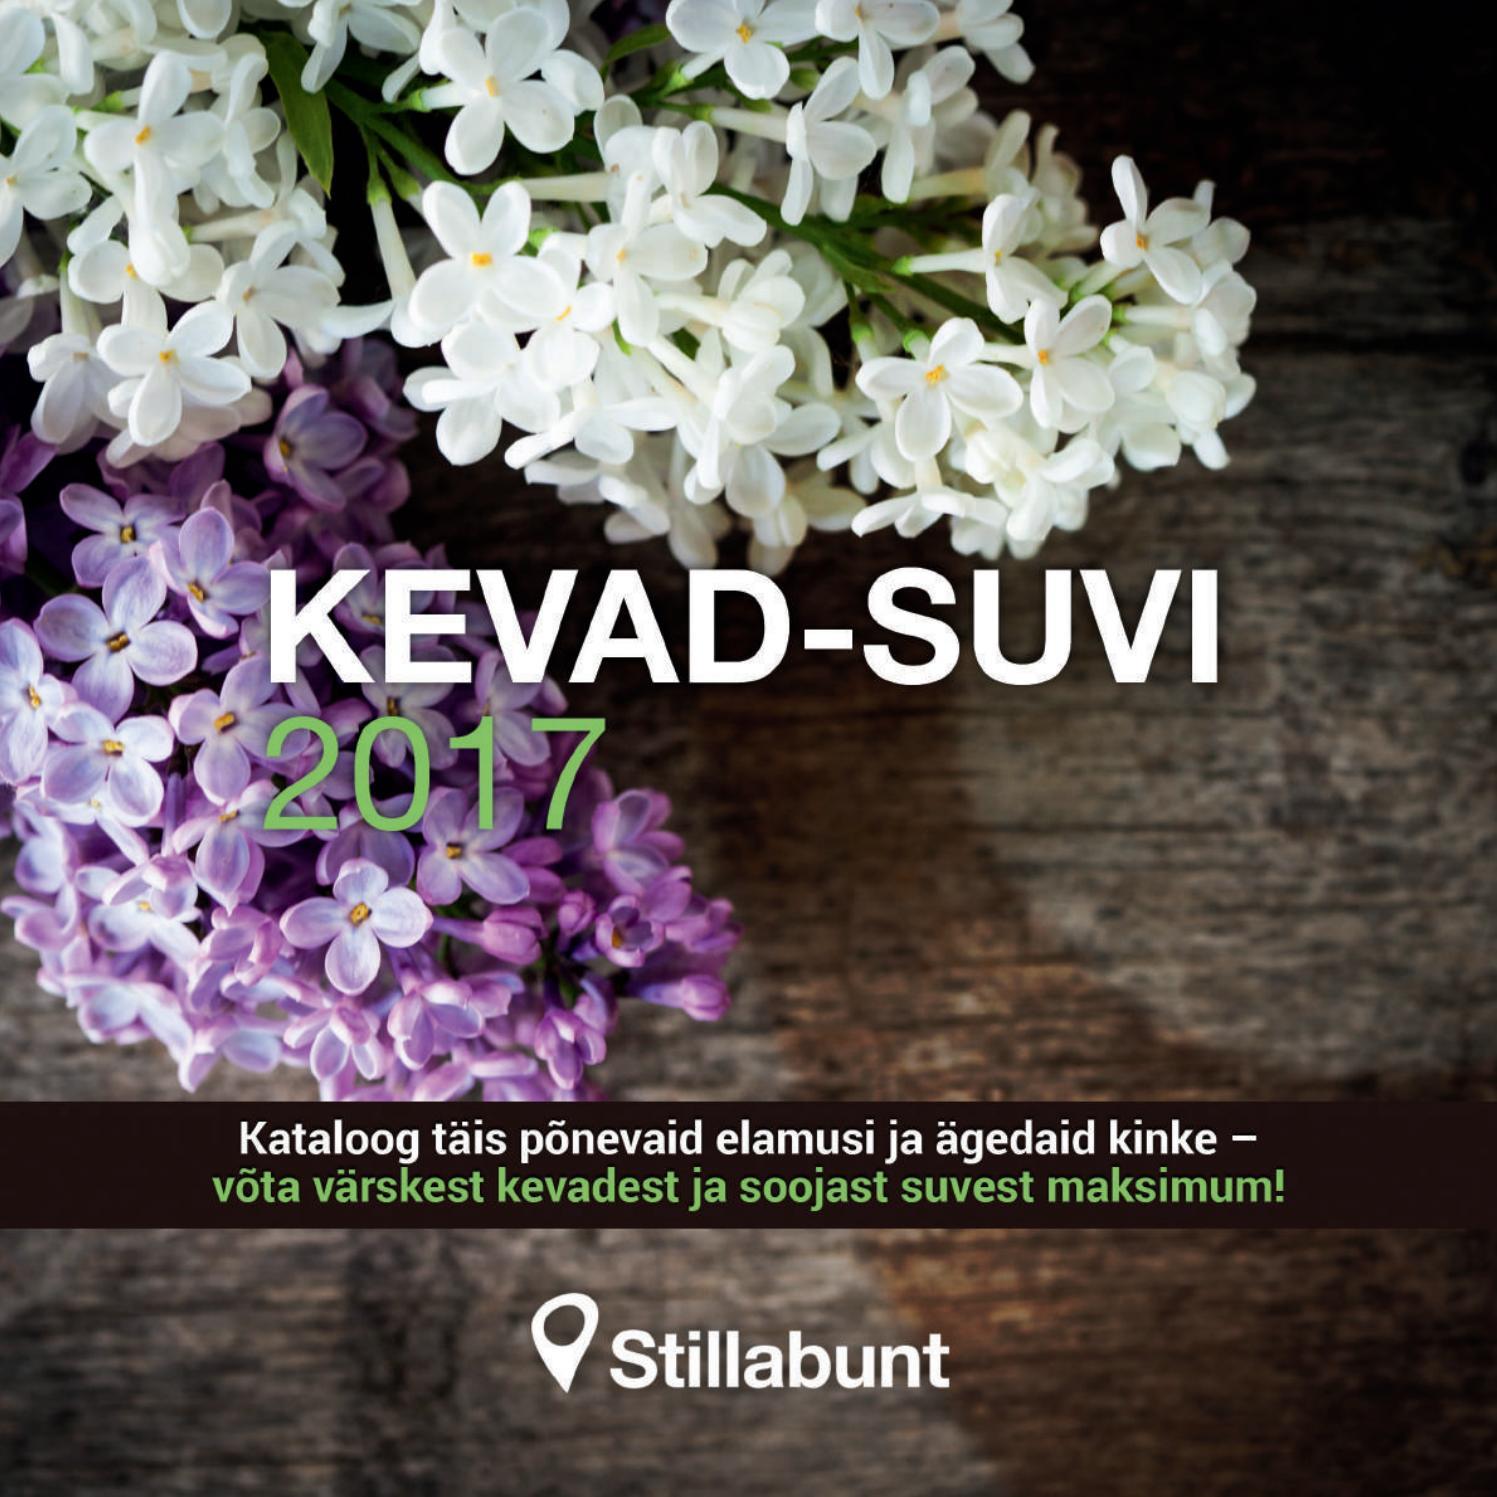 7a1d2d8e879 Moeajakiri Dream / kevad-suvi 2017 by Kaidi Laev - issuu